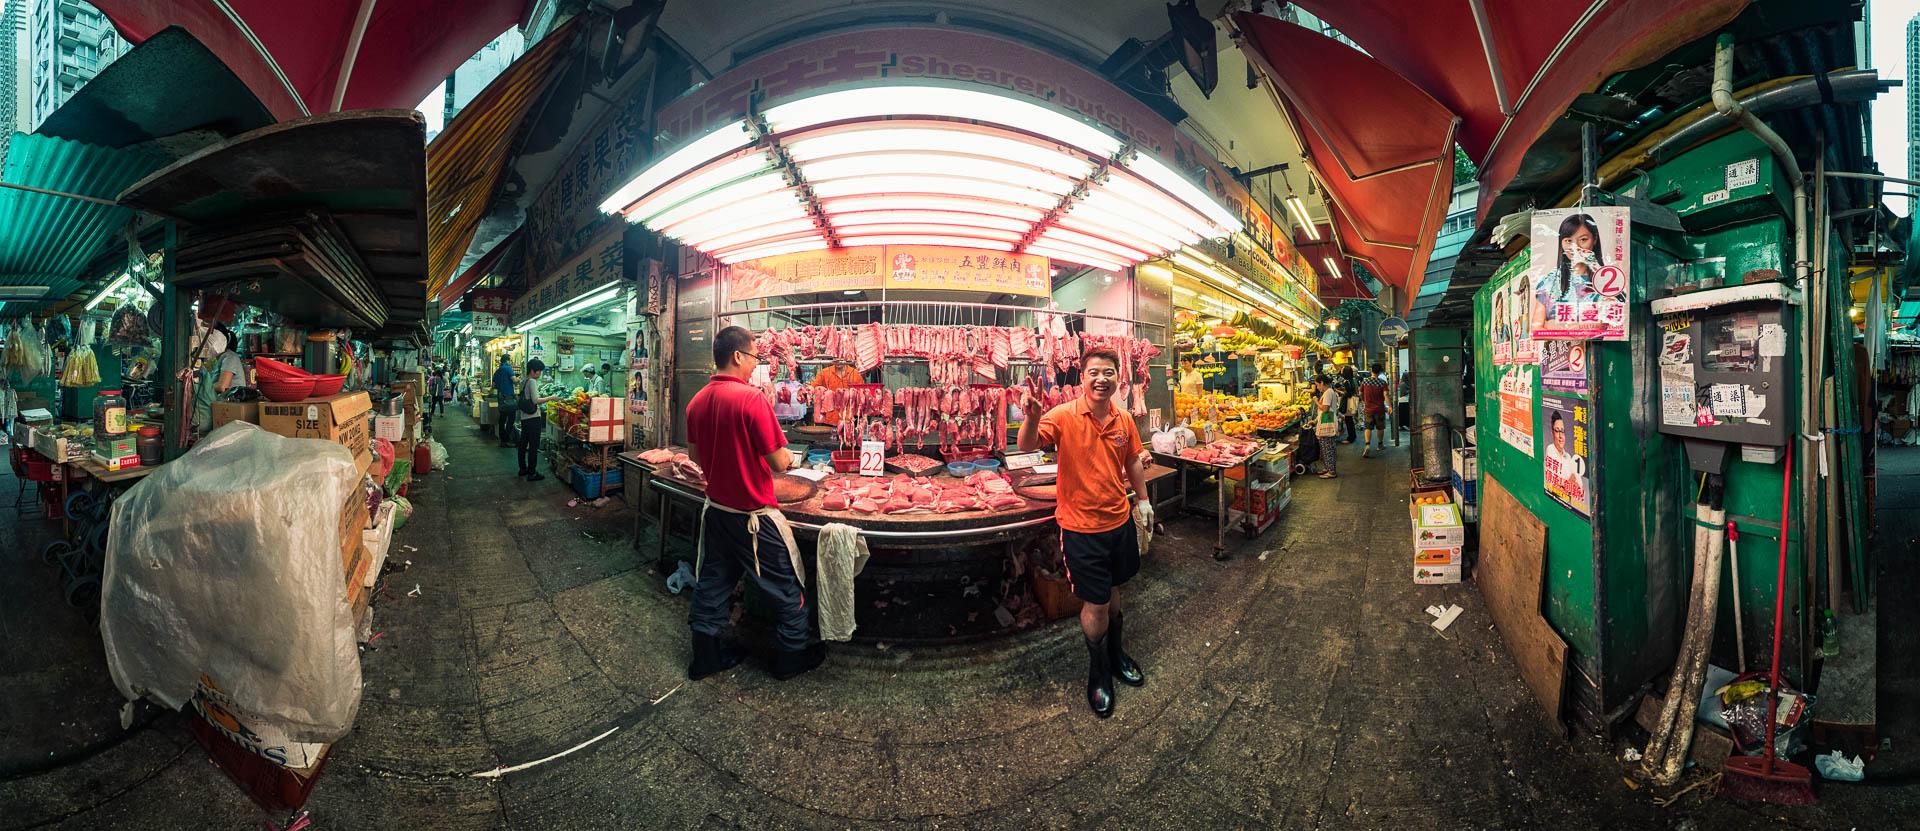 360 VR Hongkong Streetmarket Fotograf Tobi Bohn Berlin